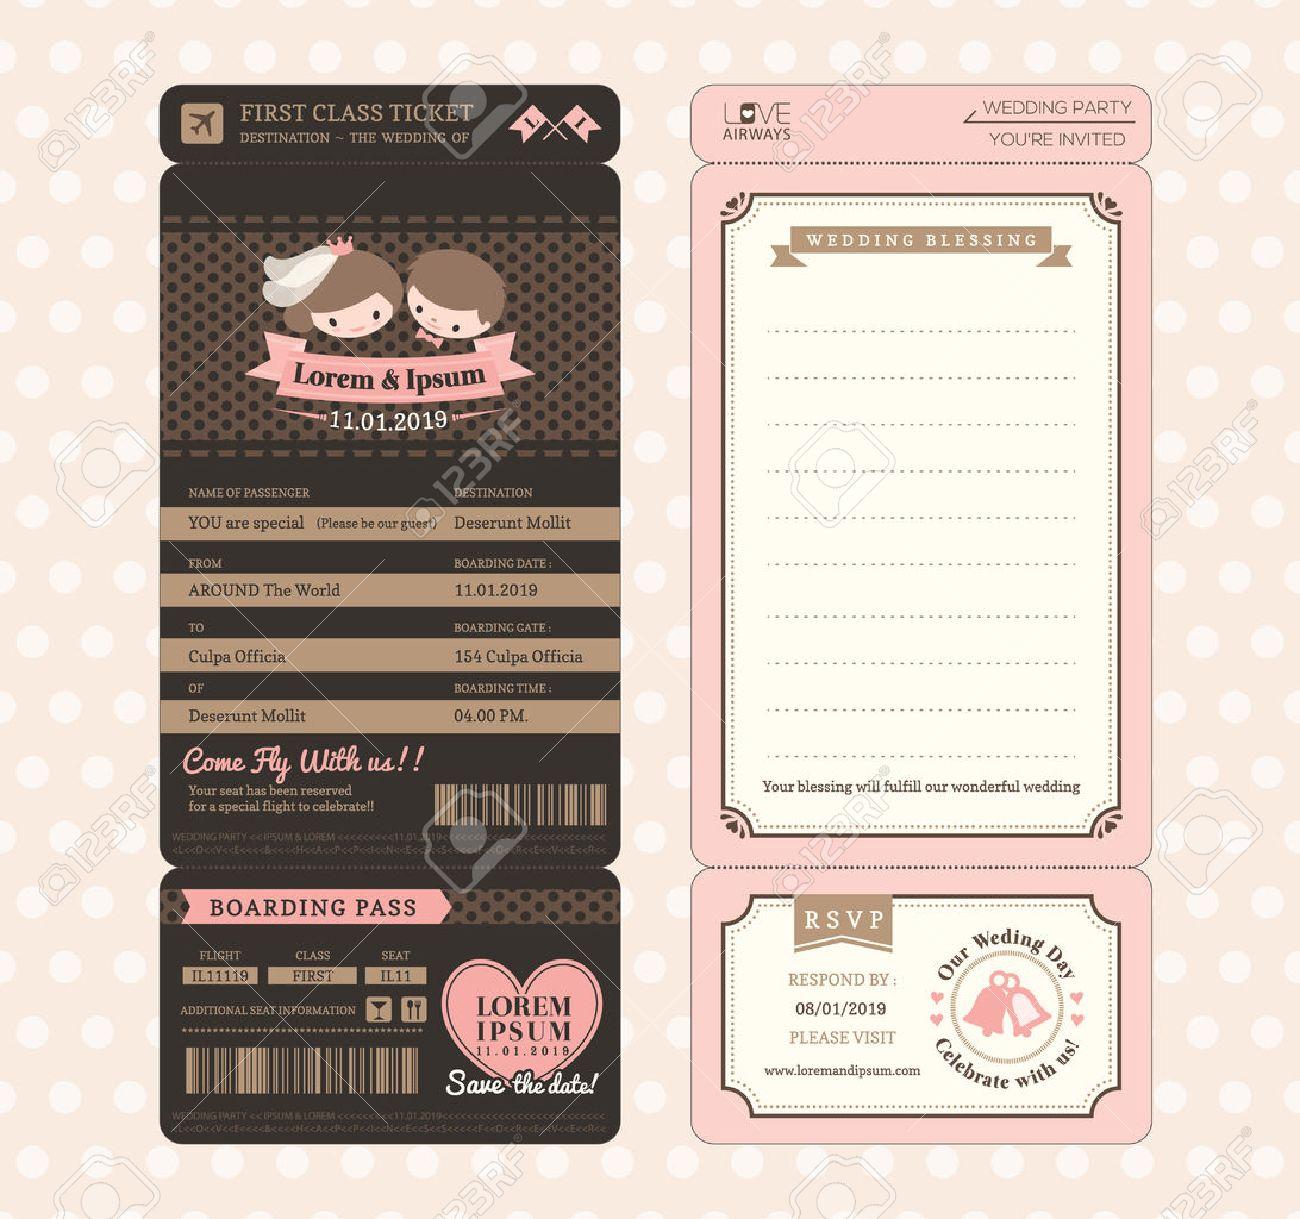 Cute Groom And Bride Vintage Boarding Pass Ticket Wedding – Plane Ticket Invitation Template